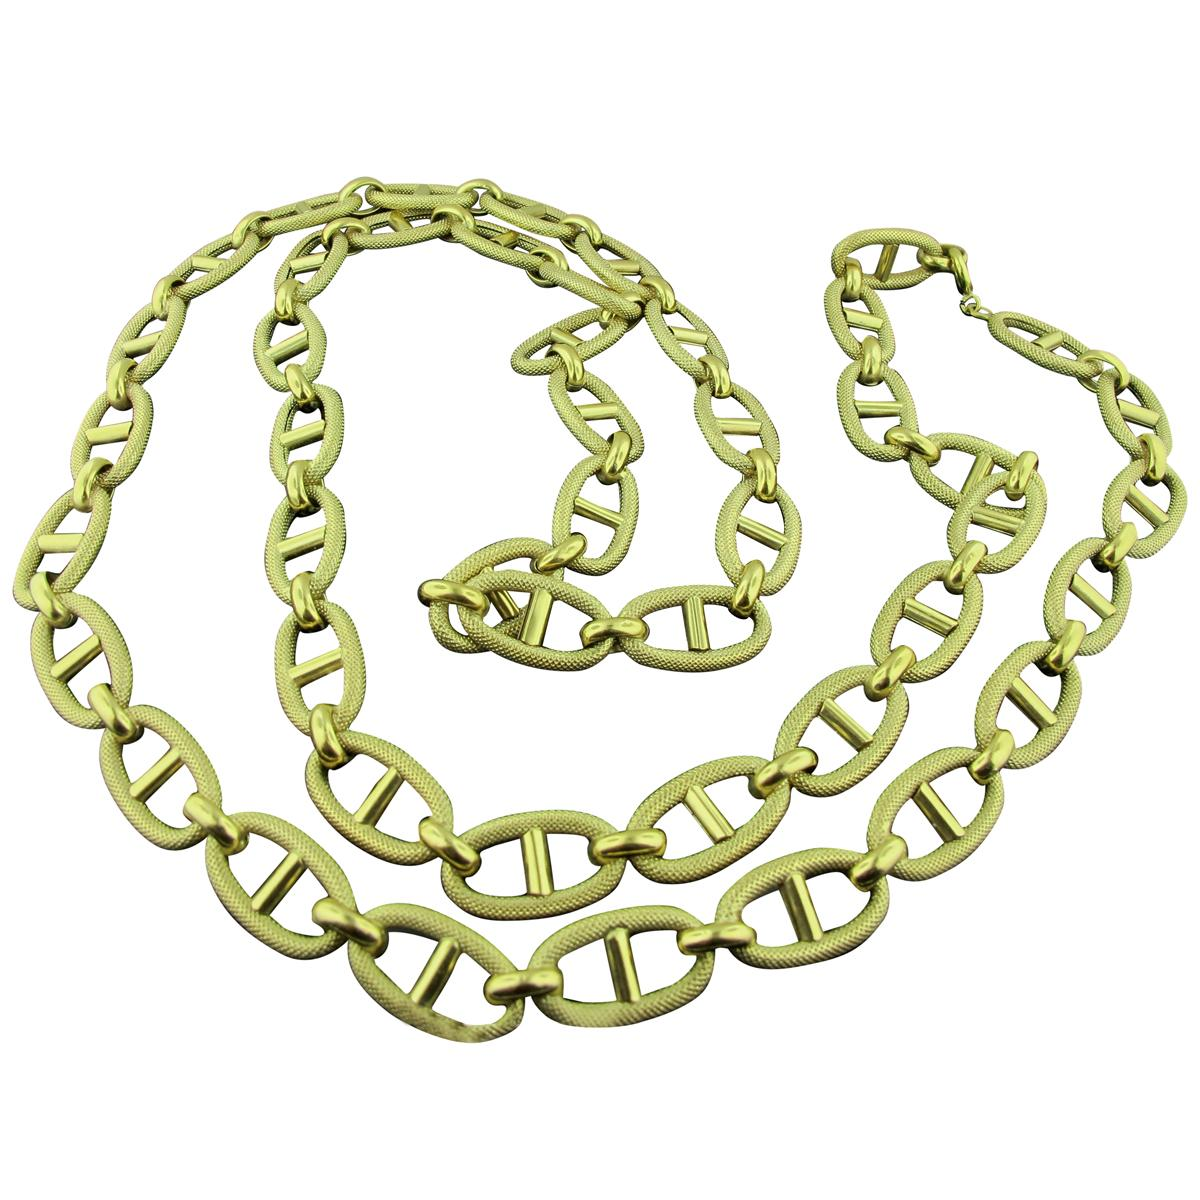 18 Karat Yellow Gold Chain Link Necklace